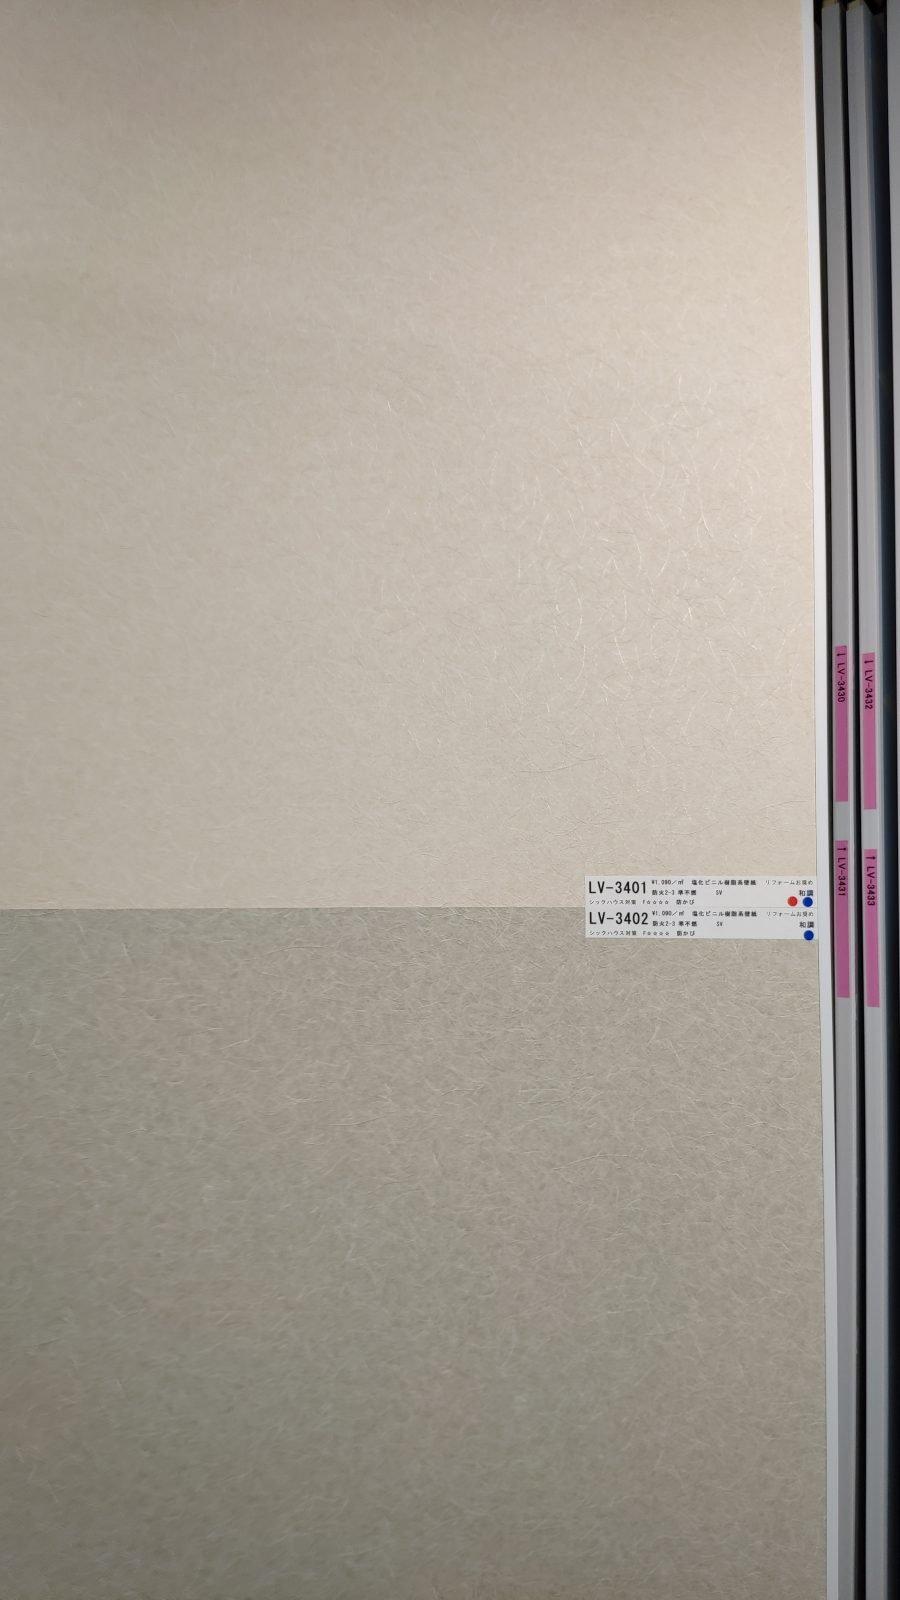 LV-3401(LTS470) / LV-3402(LTS471)